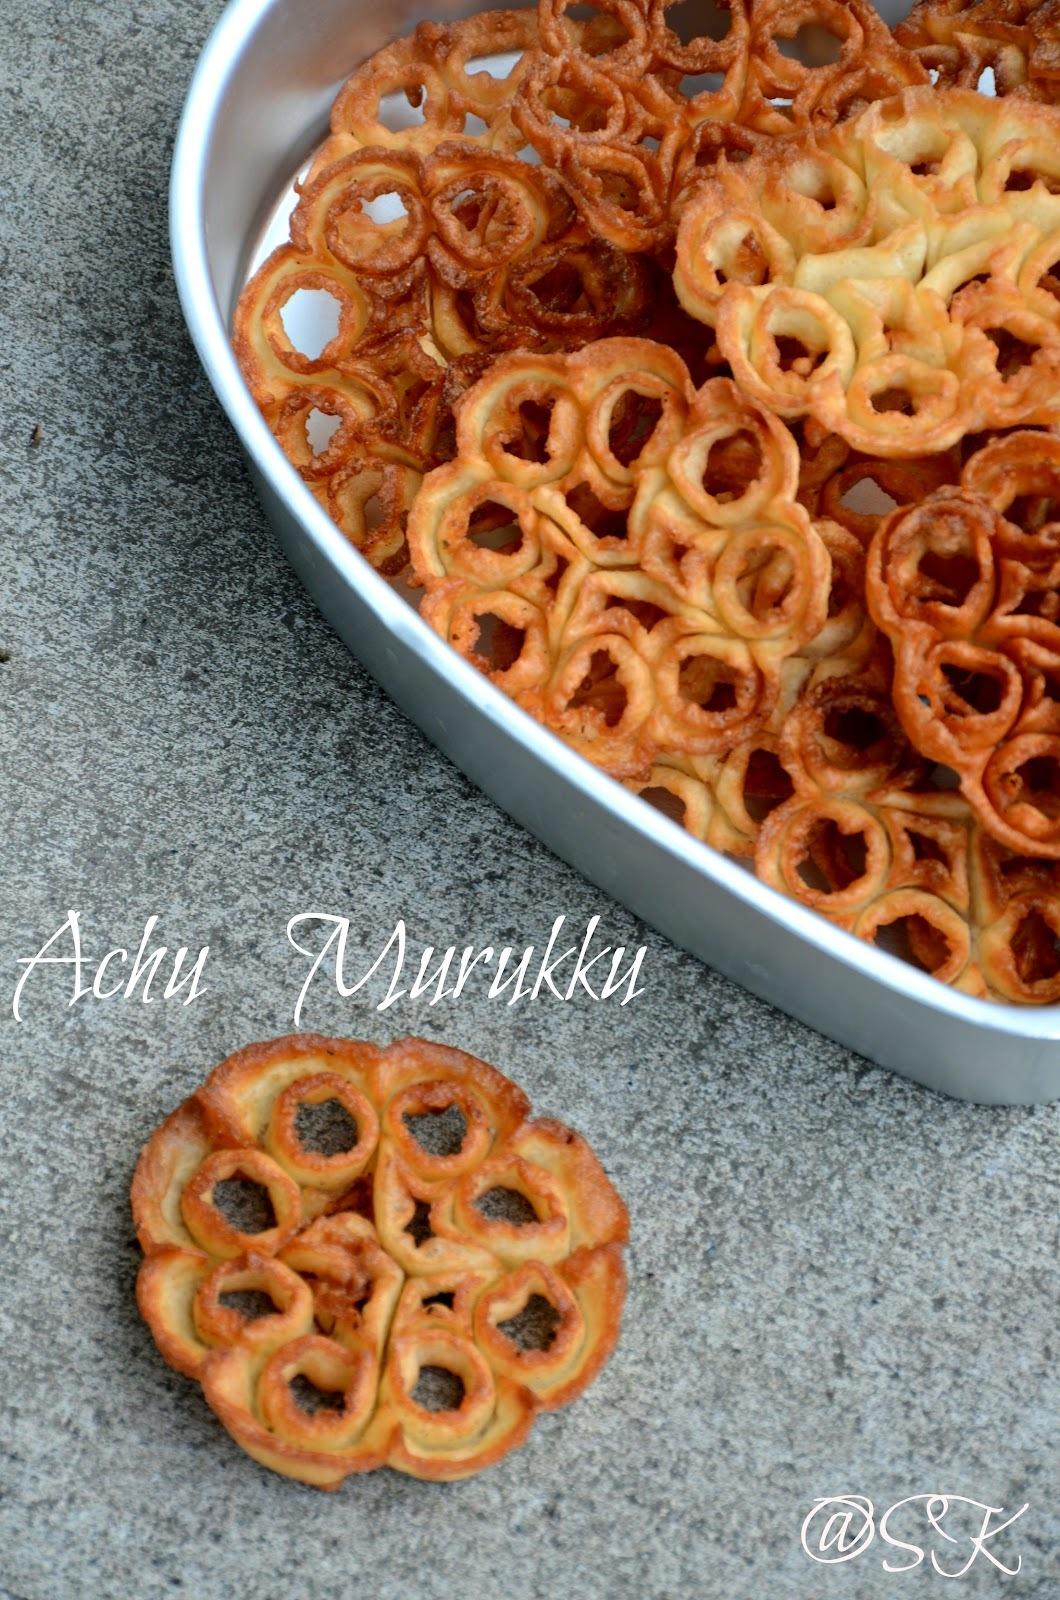 Rose Cookies - Achappam - அச்சு முறுக்கு - Christmas Recipes - Step by Step